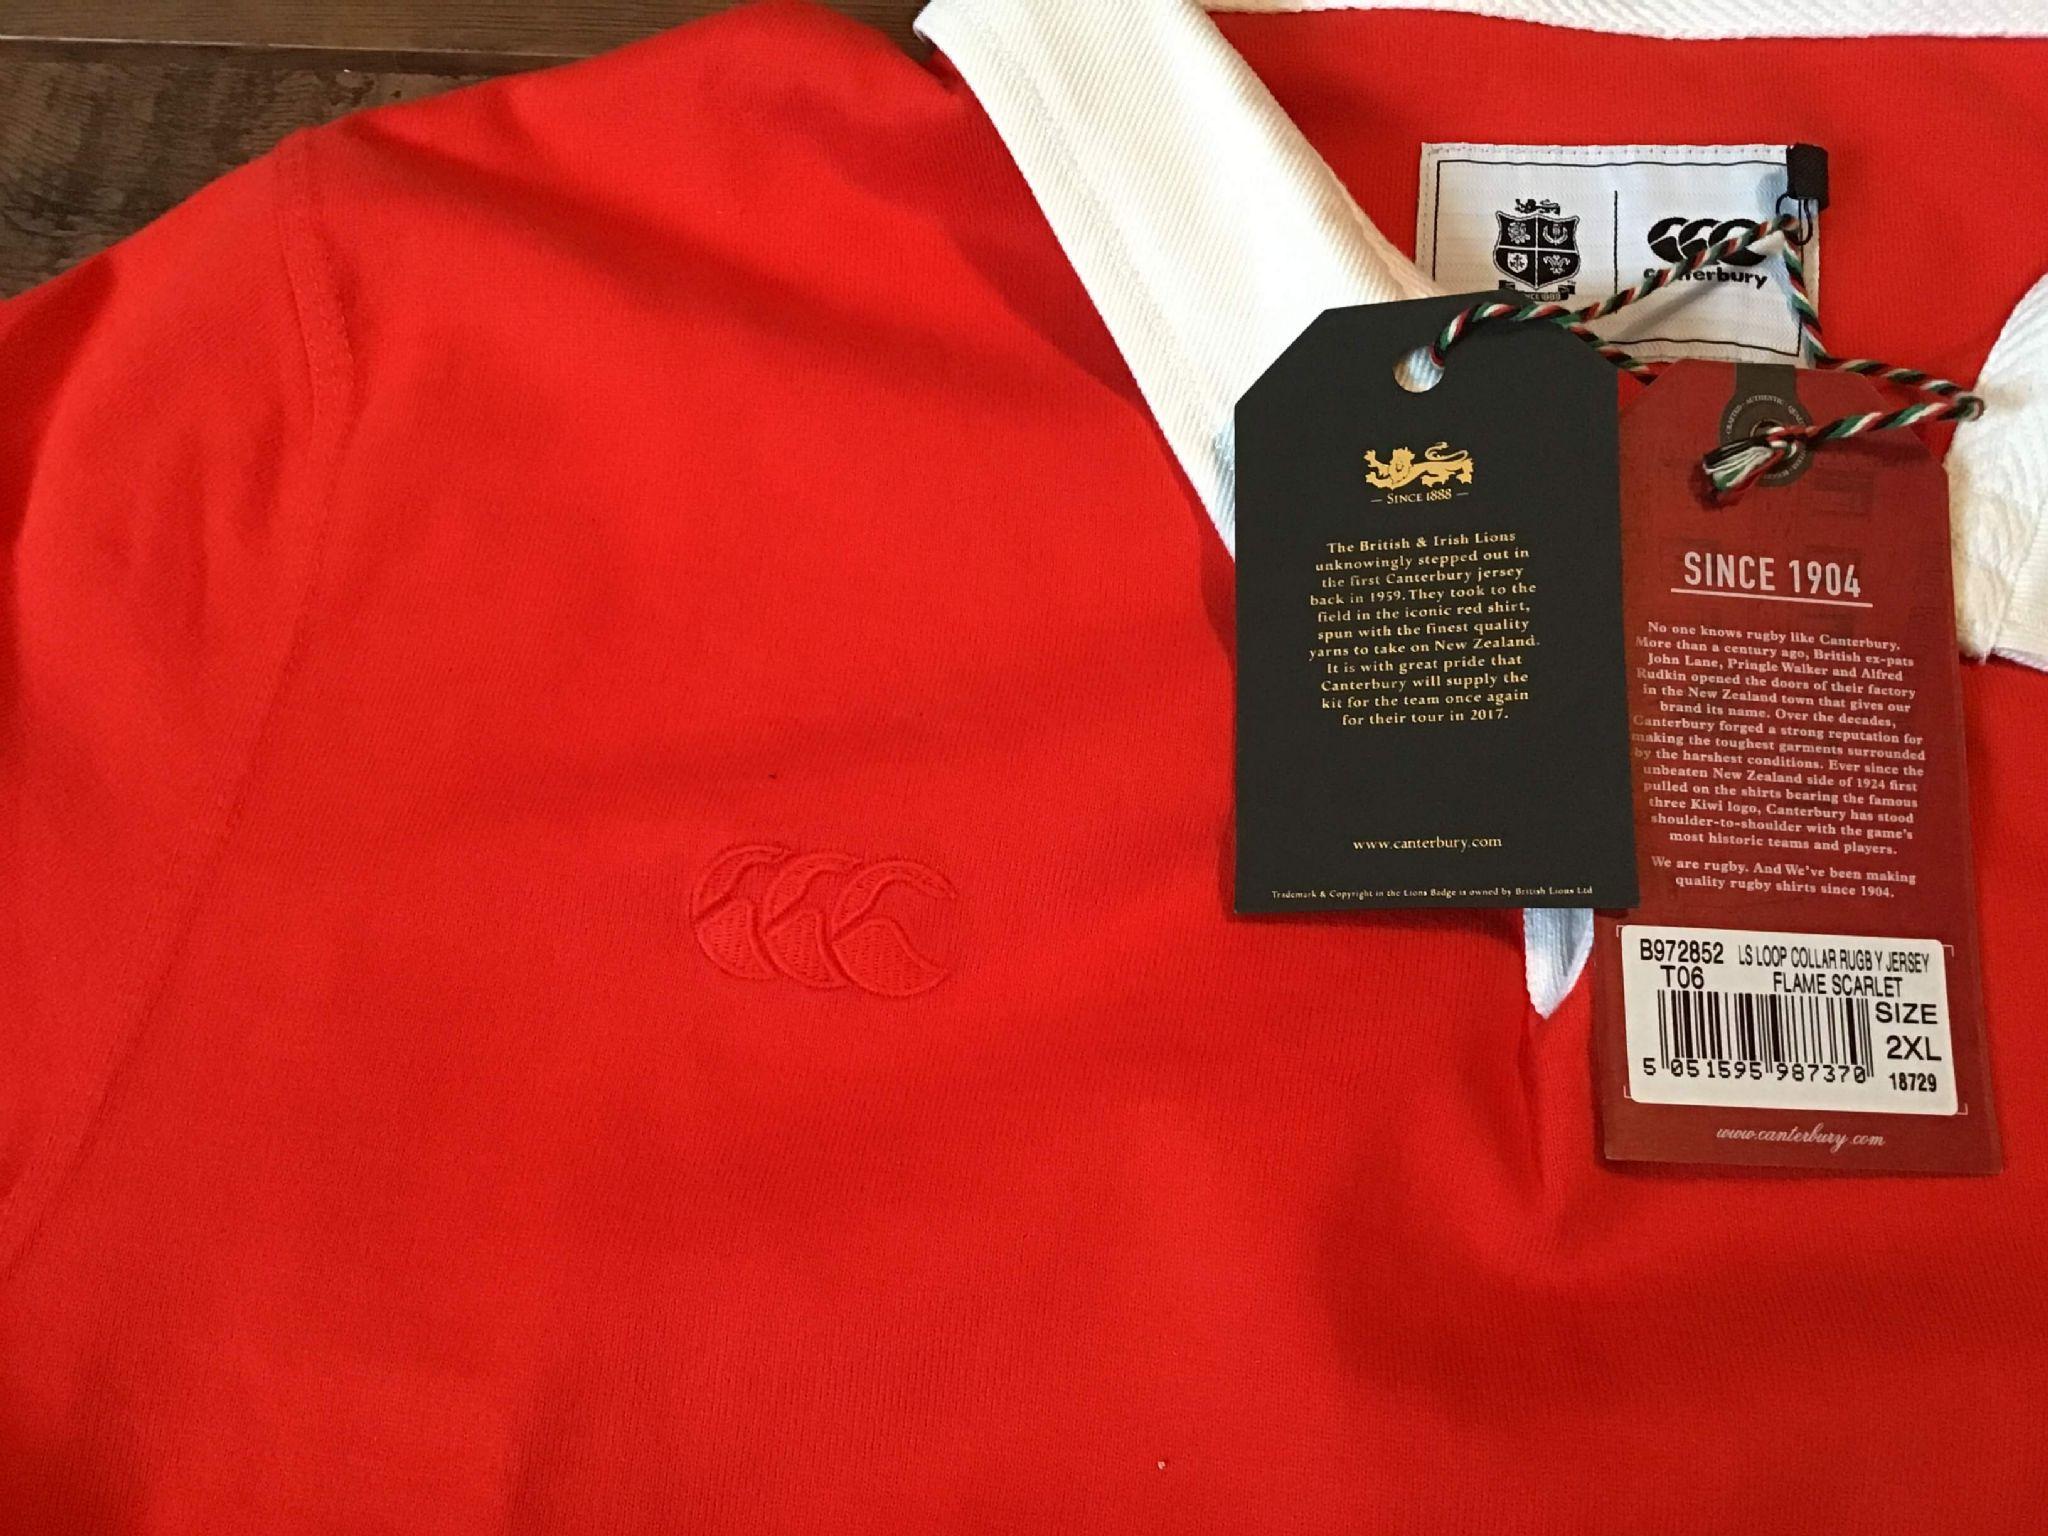 8b8c7c62 Classic Rugby Shirts | 1959 British and Irish Lions Vintage Old Jerseys